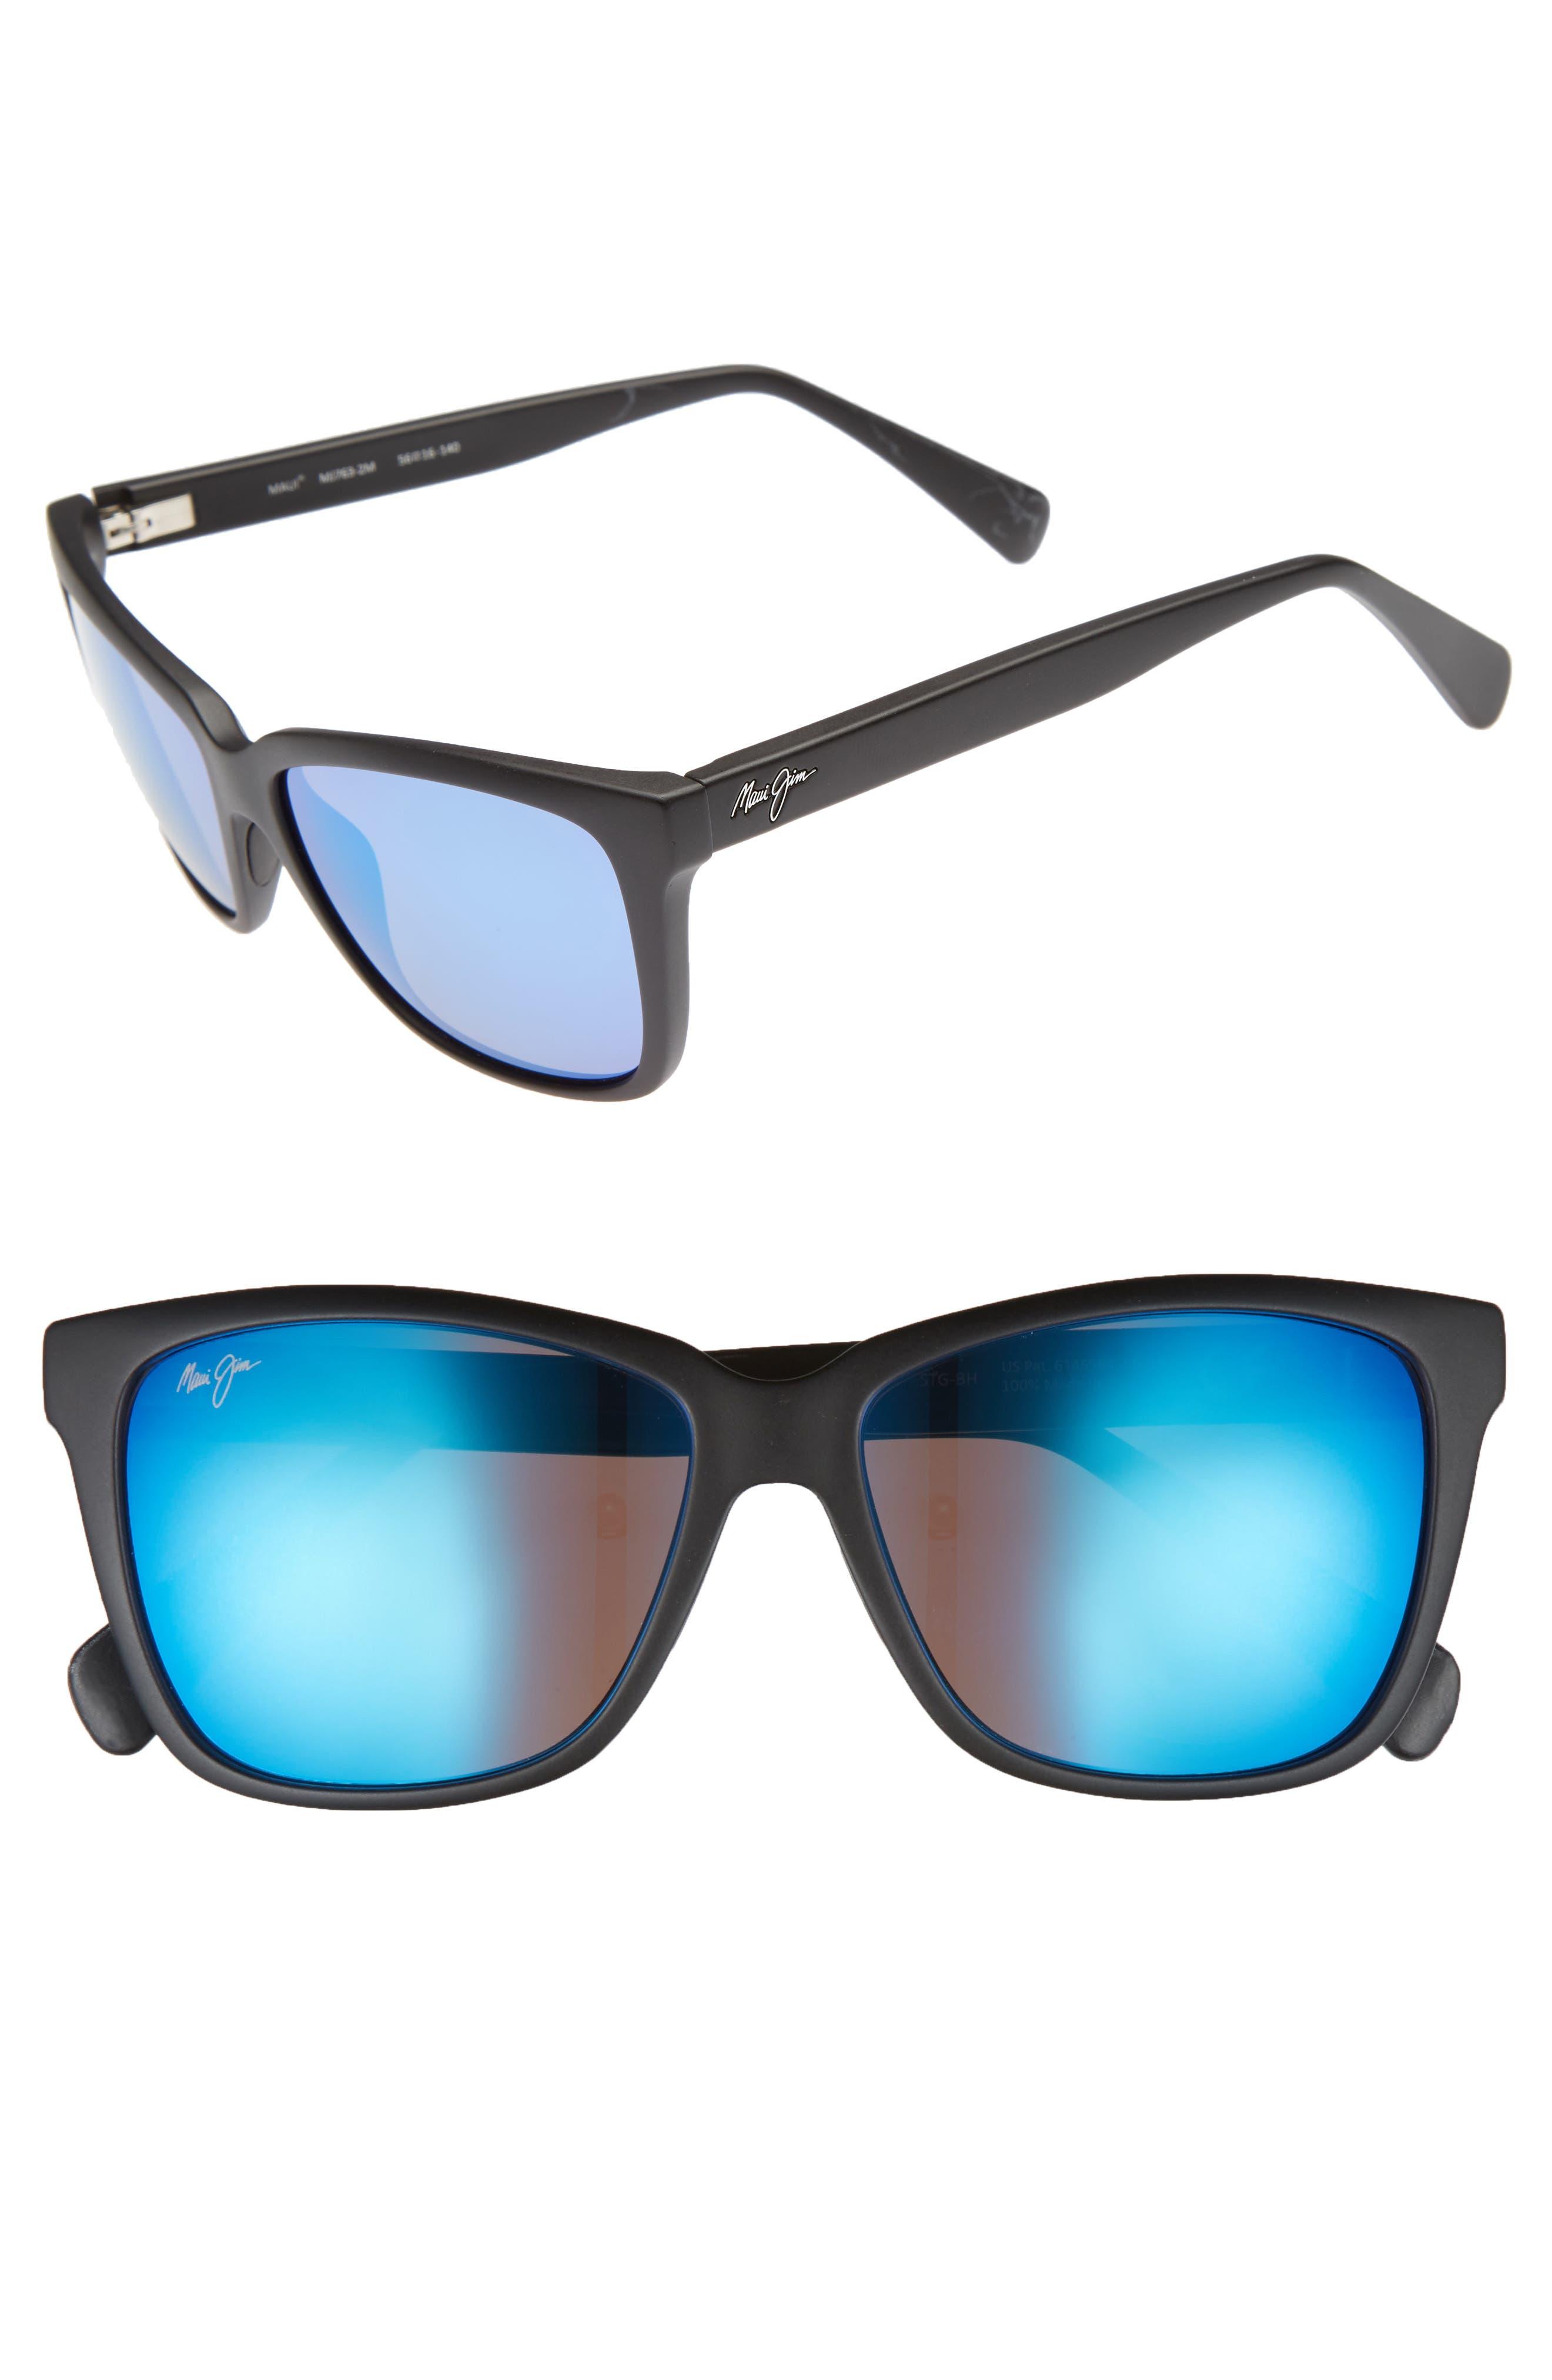 56mm Jacaranda Polarized Sunglasses,                             Main thumbnail 1, color,                             001